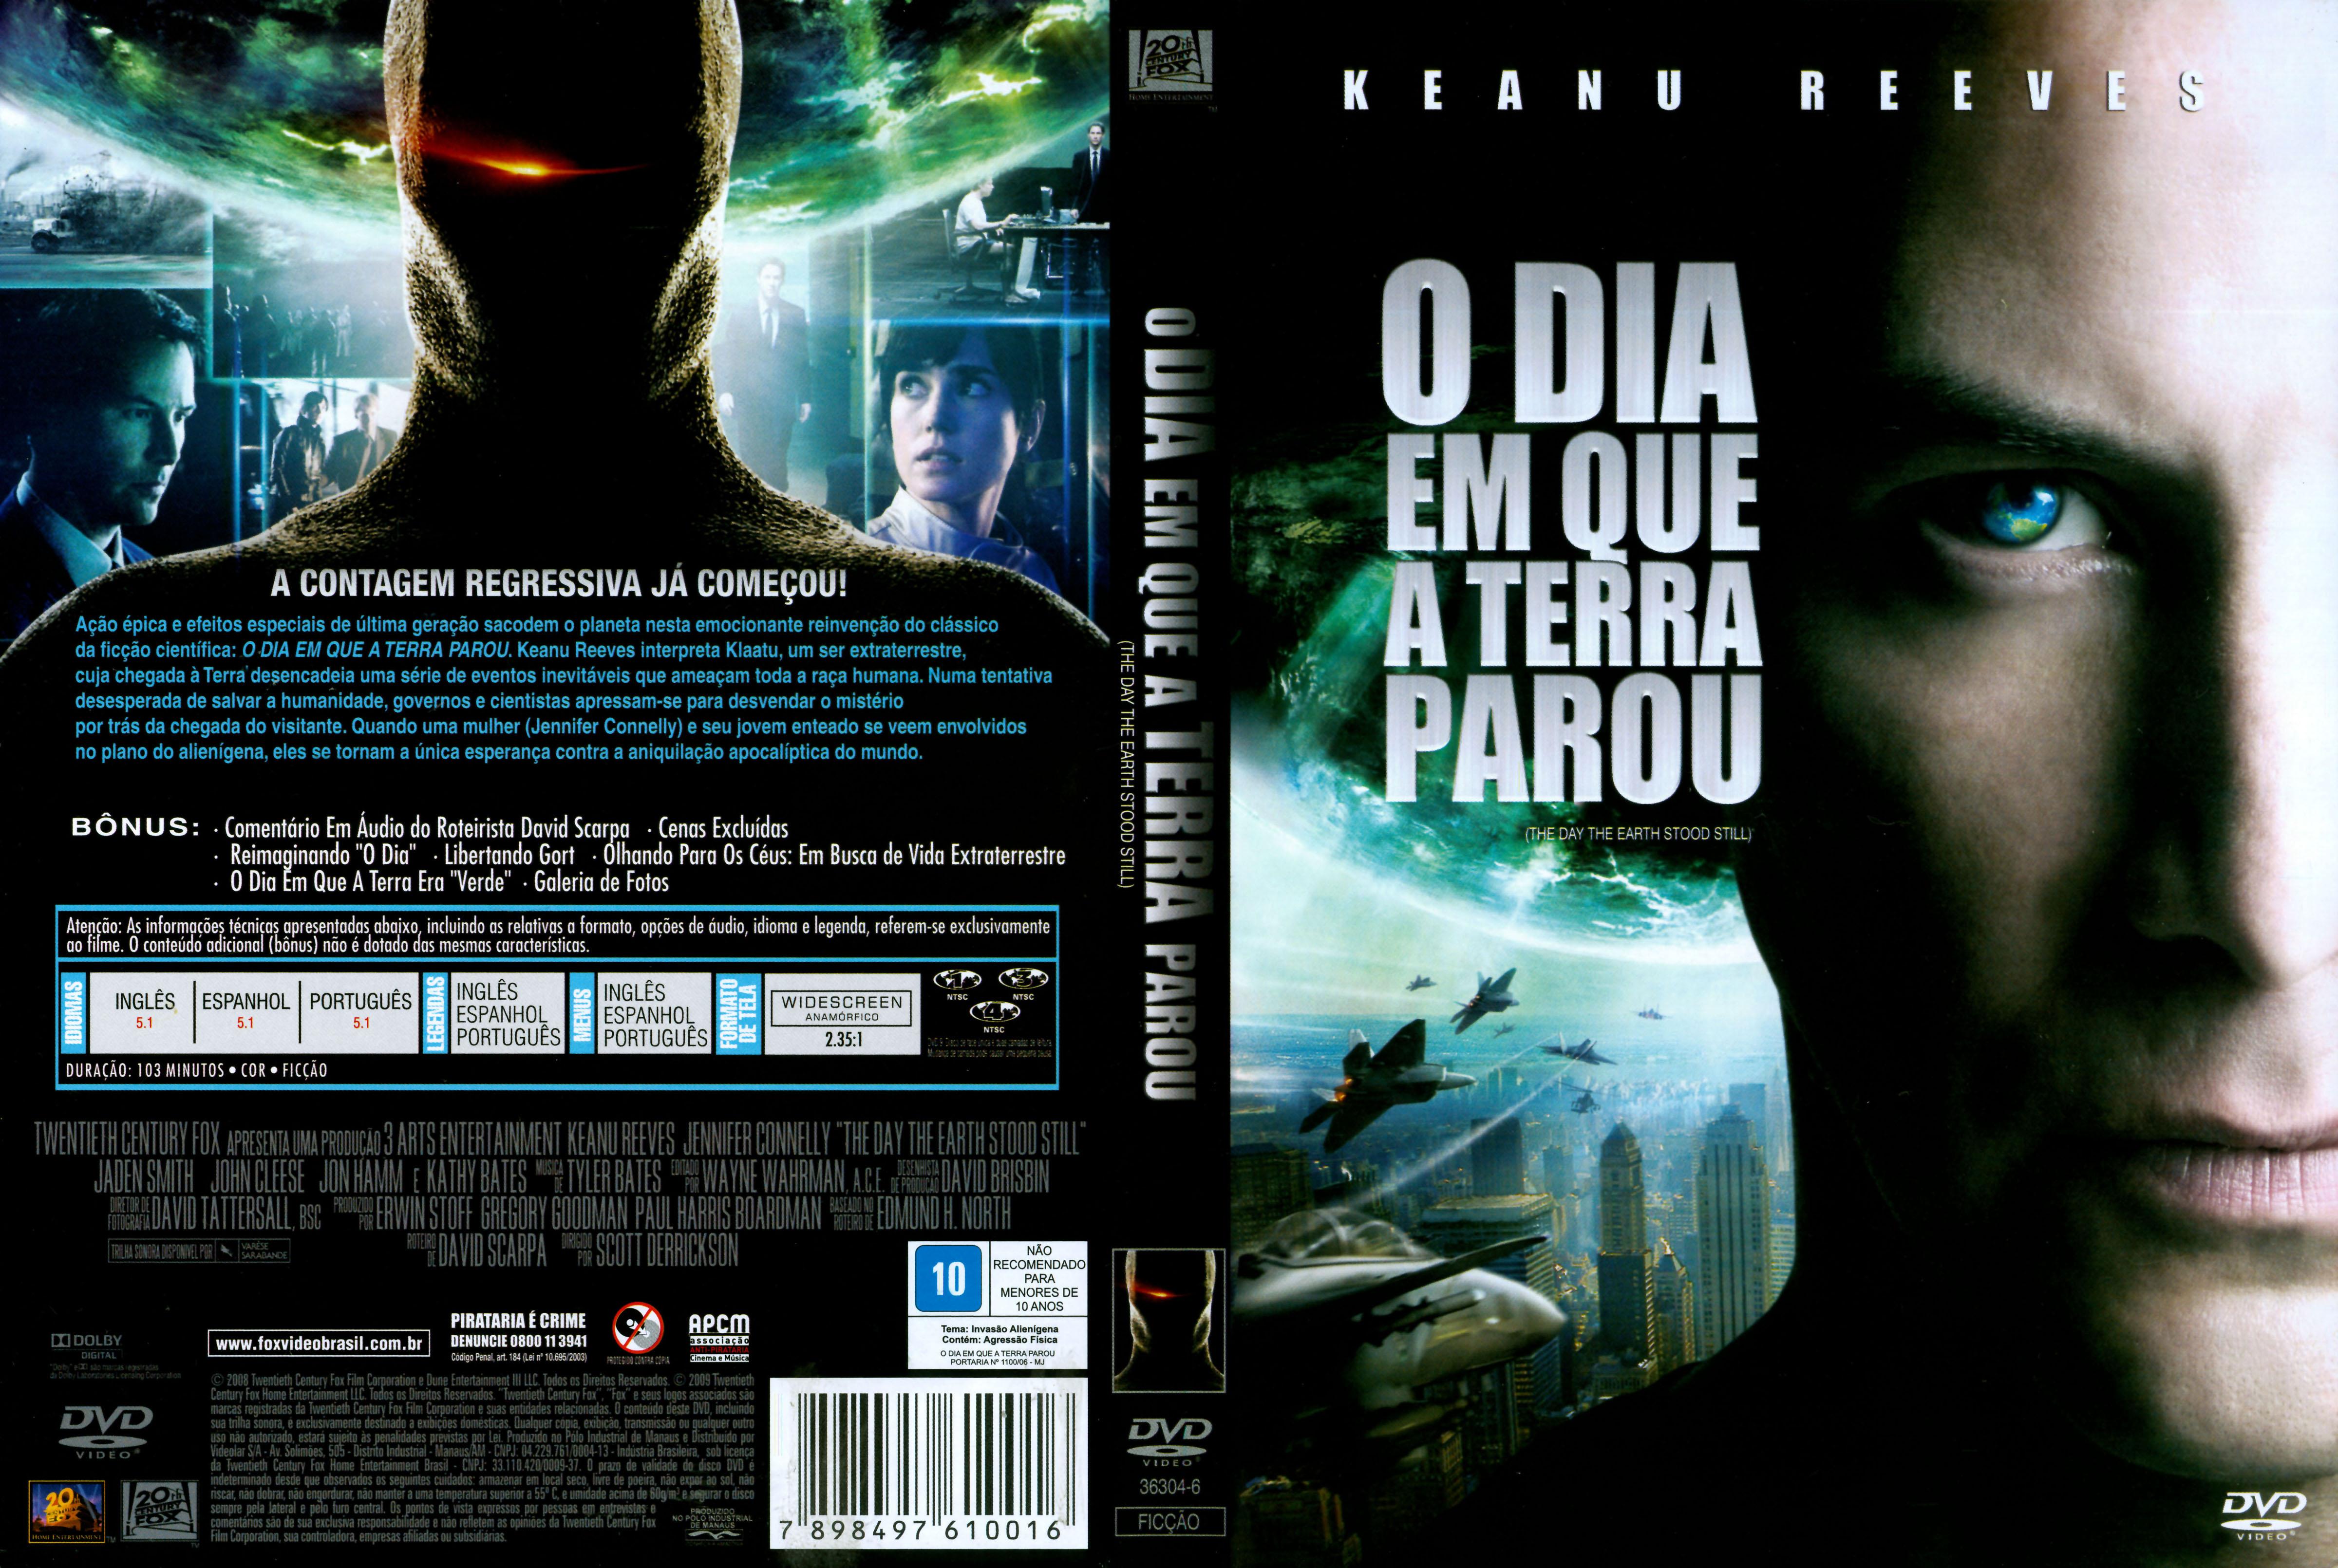 ODiaEmQueATerraParou